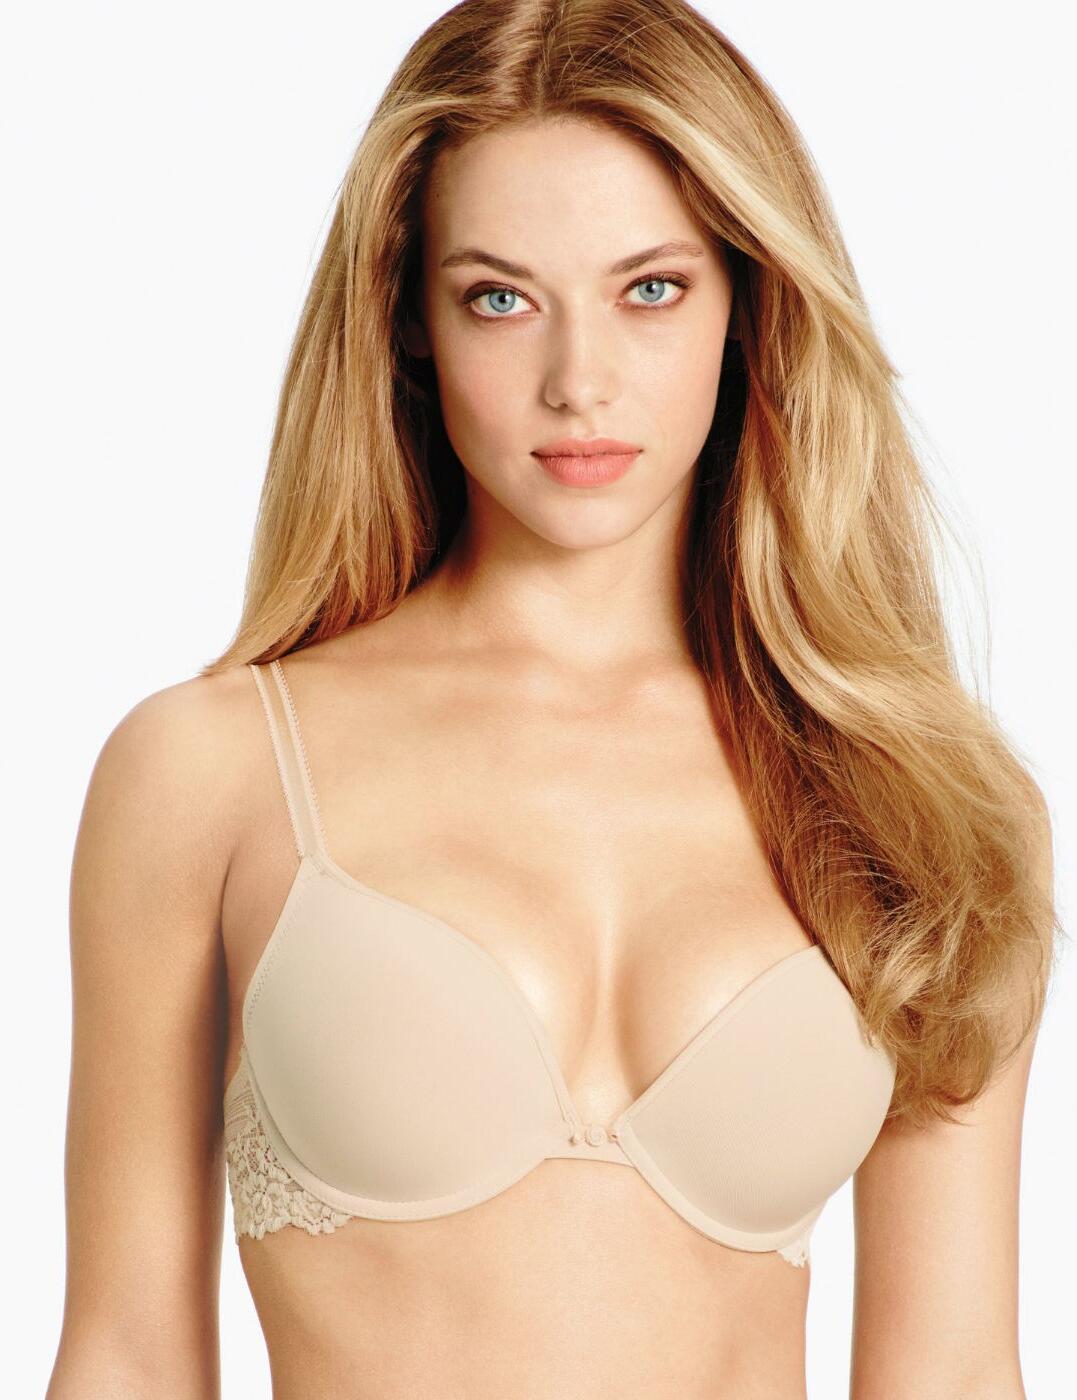 858191 Wacoal Embrace Lace Push Up Bra - 858191 Nude/Ivory